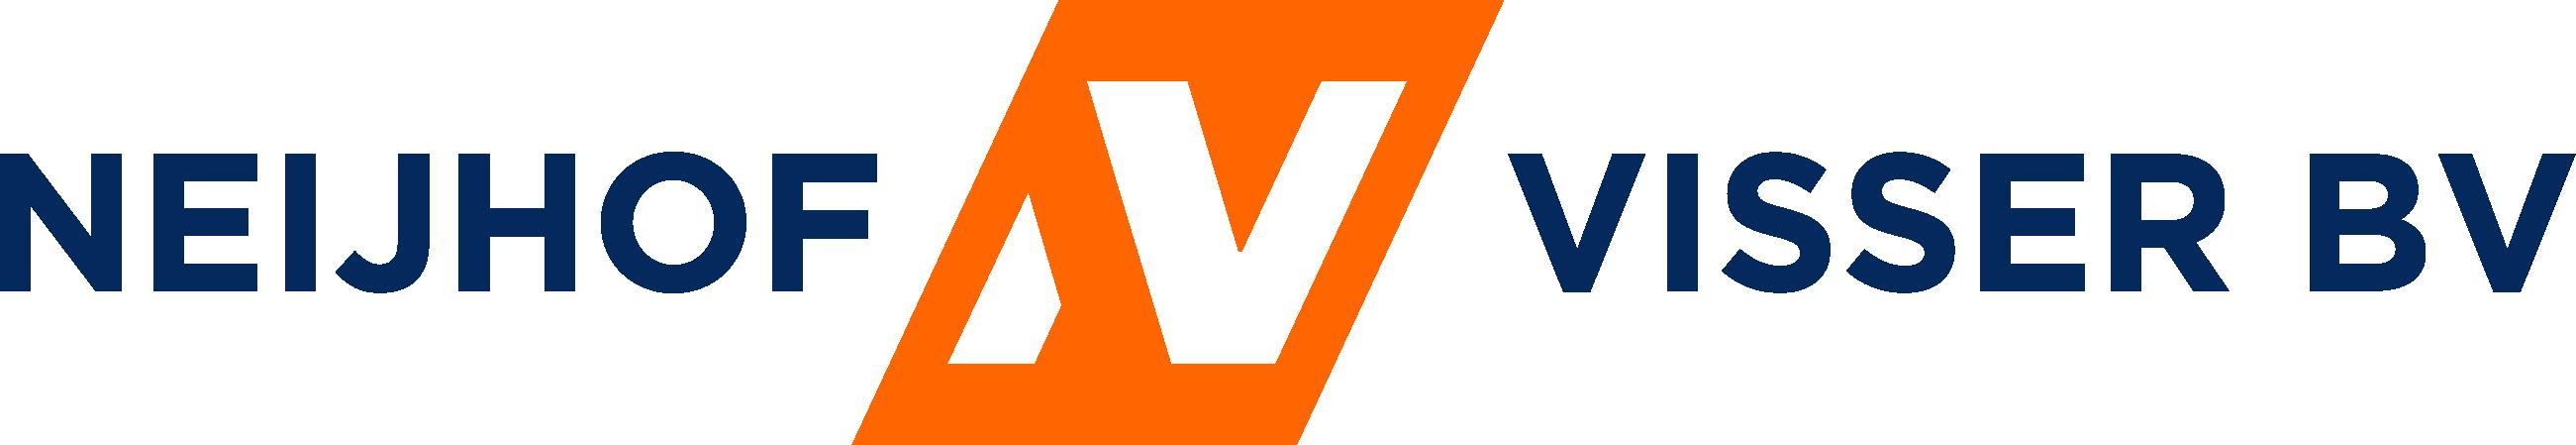 Neijhof & Visser